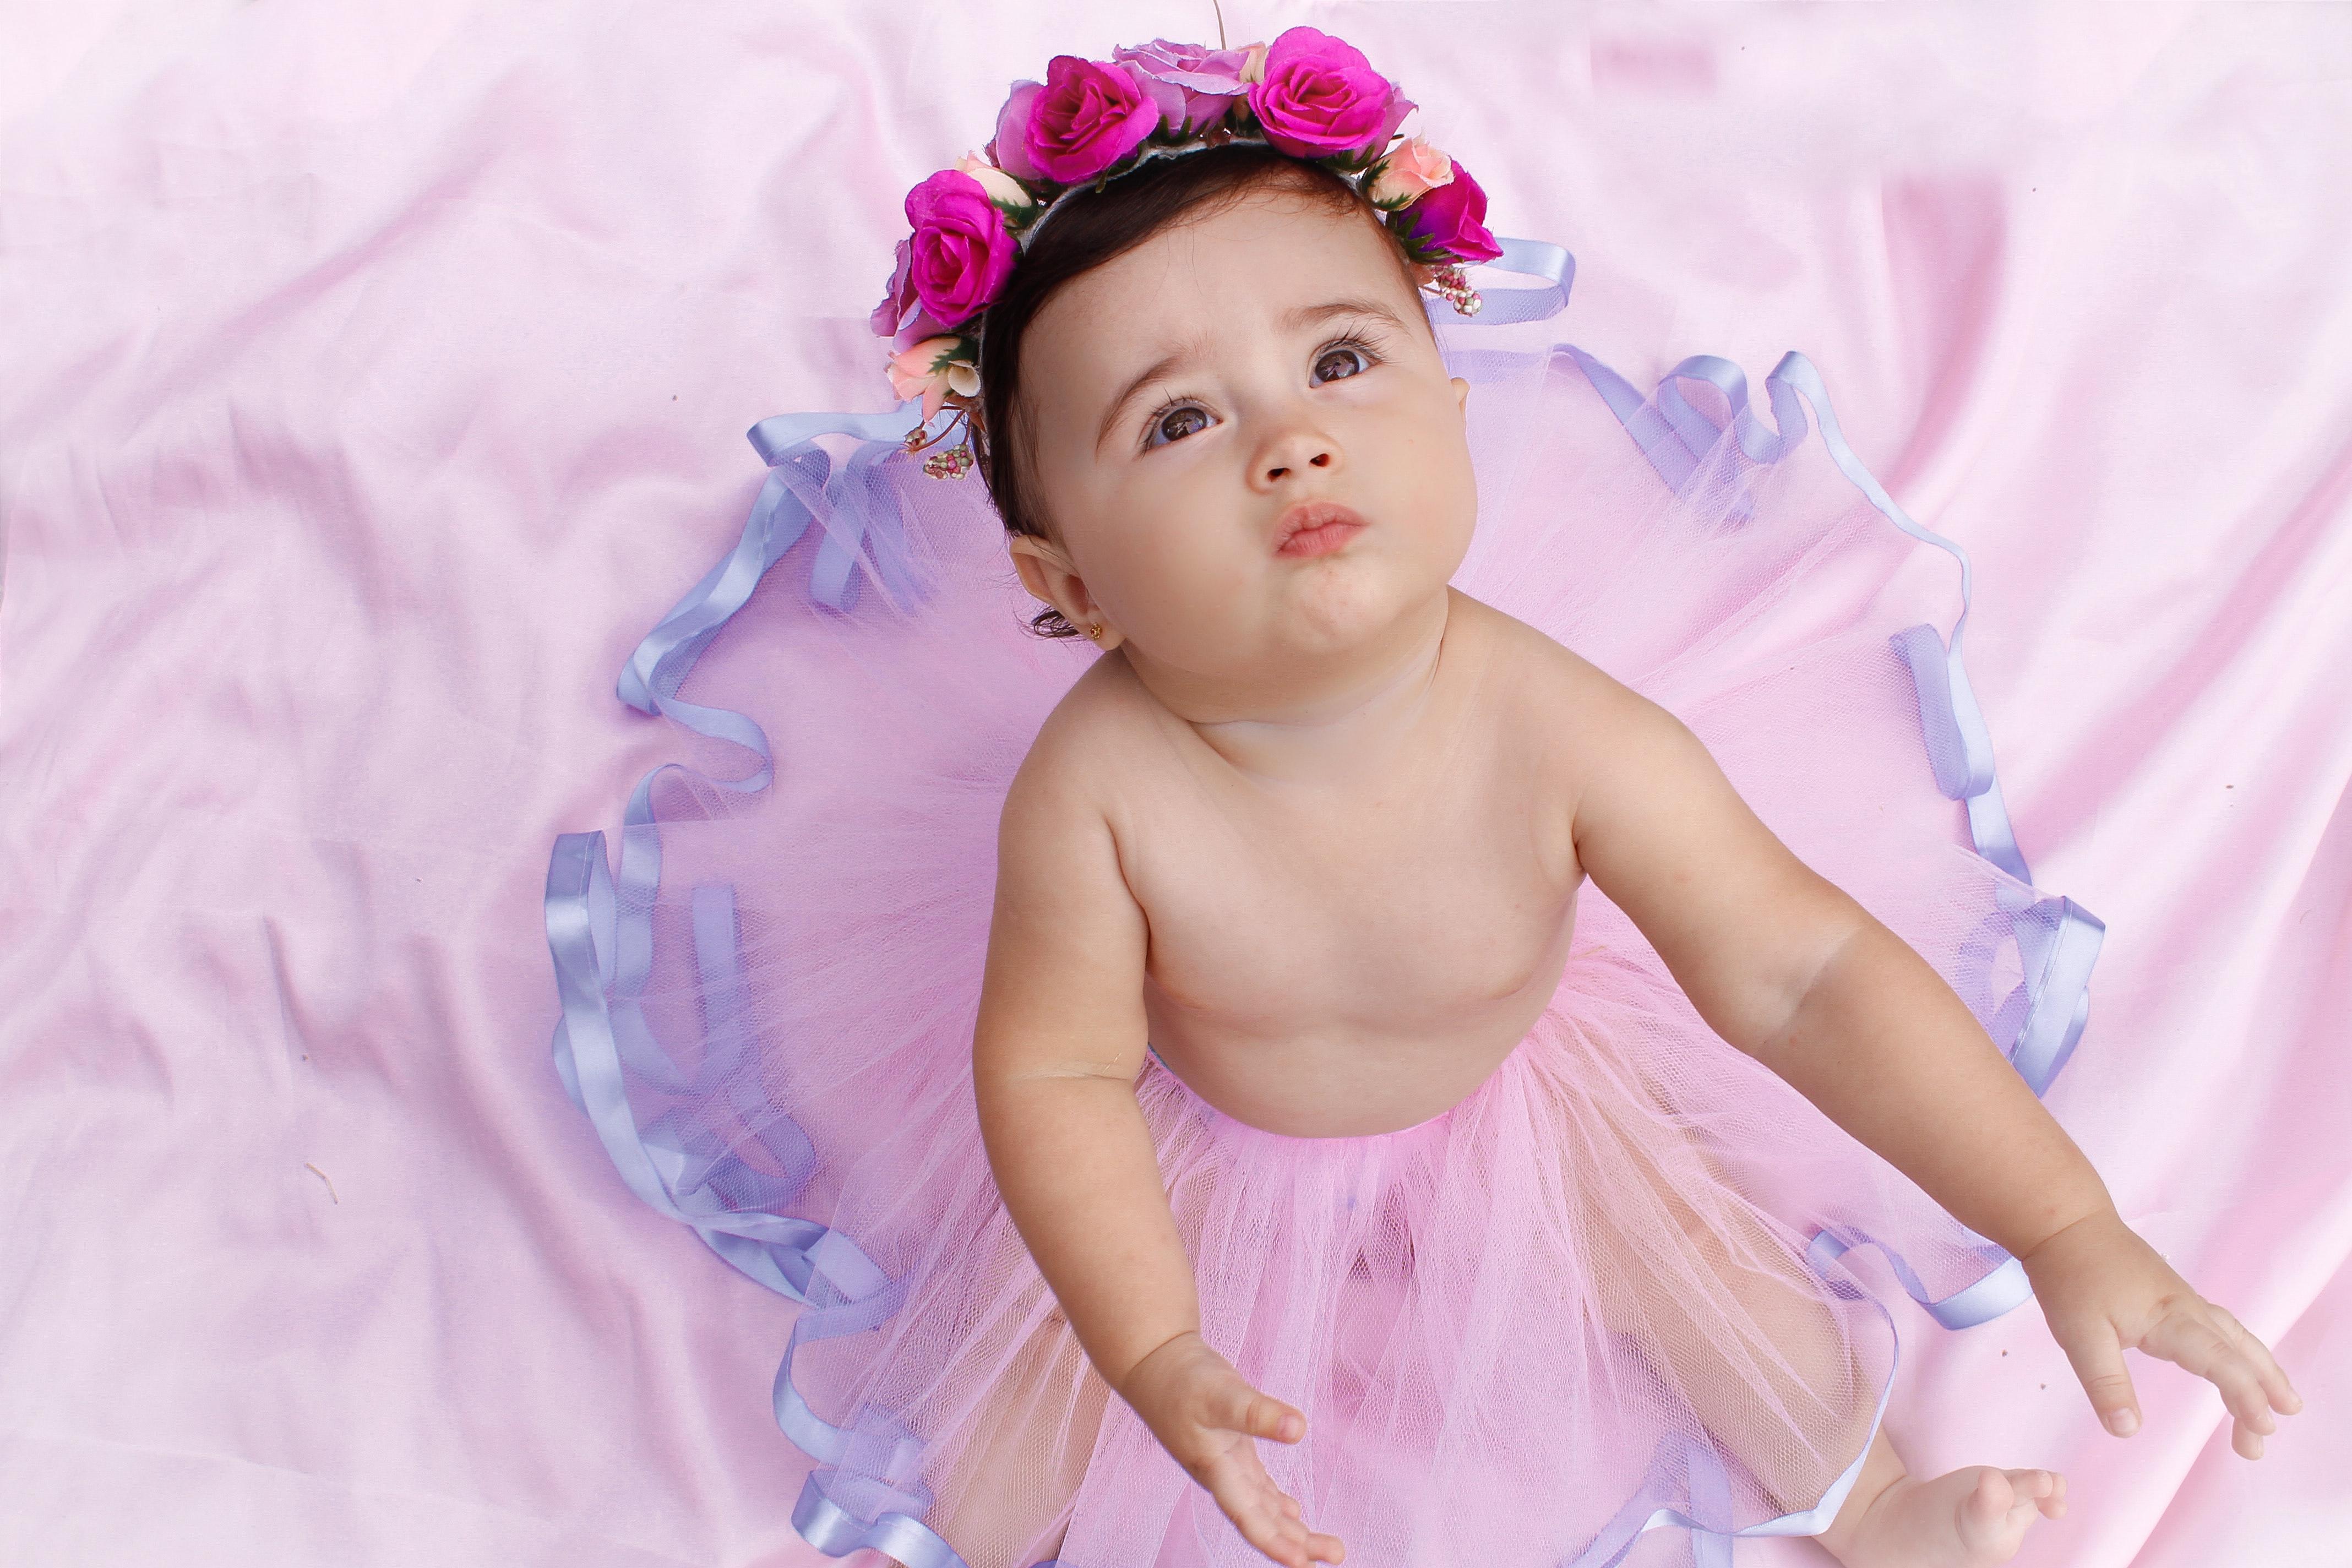 download wallpapers of cute babies Gallery